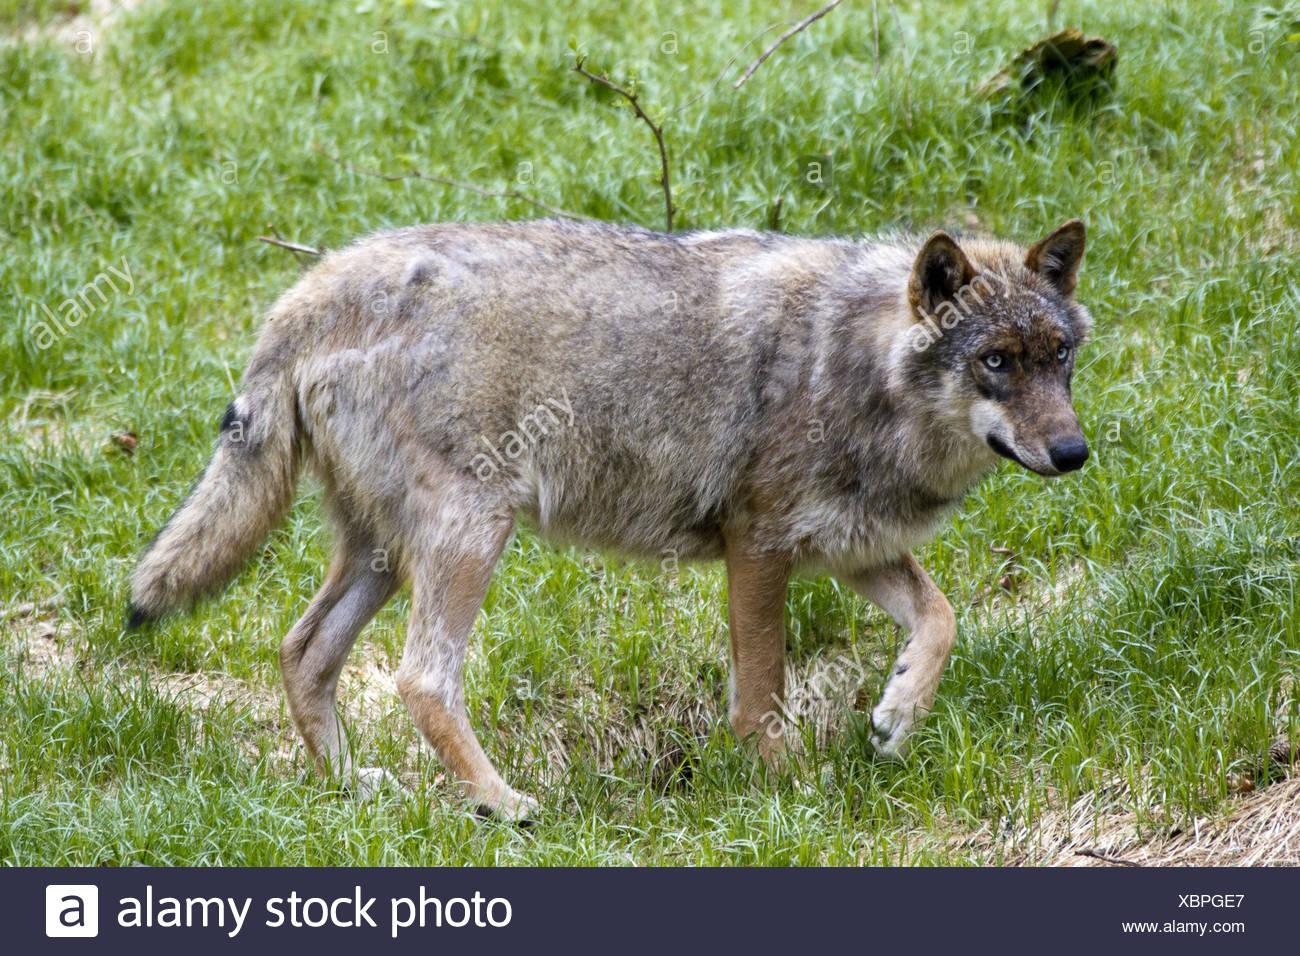 Lone wolf Stockbild